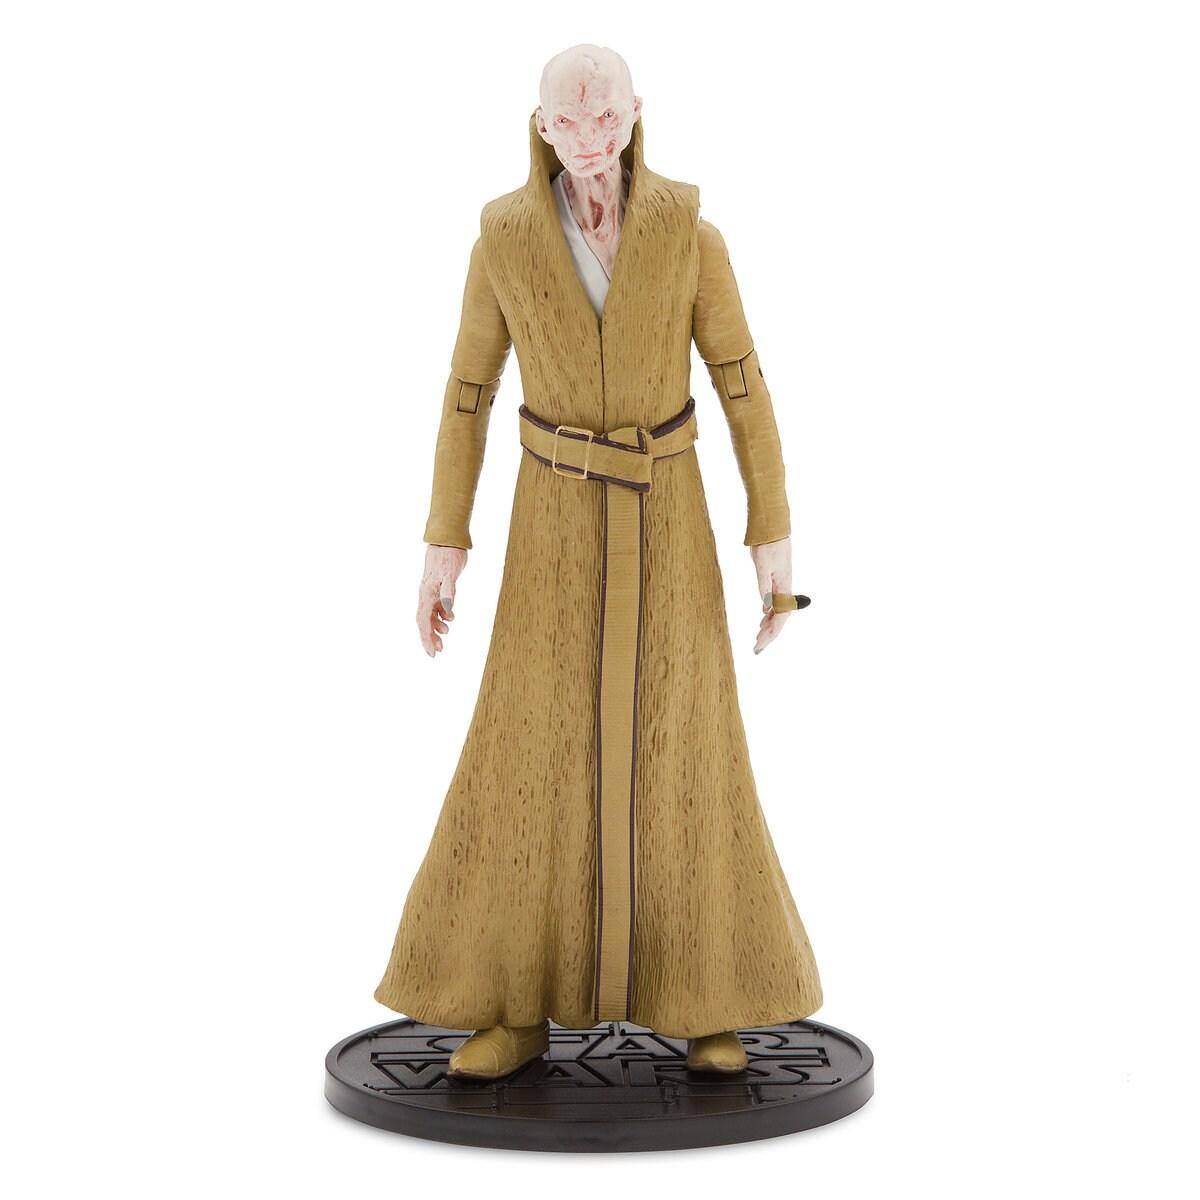 1466c372b79c ... The Last Jedi.  26.95  5.99. Product Image of Supreme Leader Snoke  Elite Series Die Cast Action Figure - Star Wars